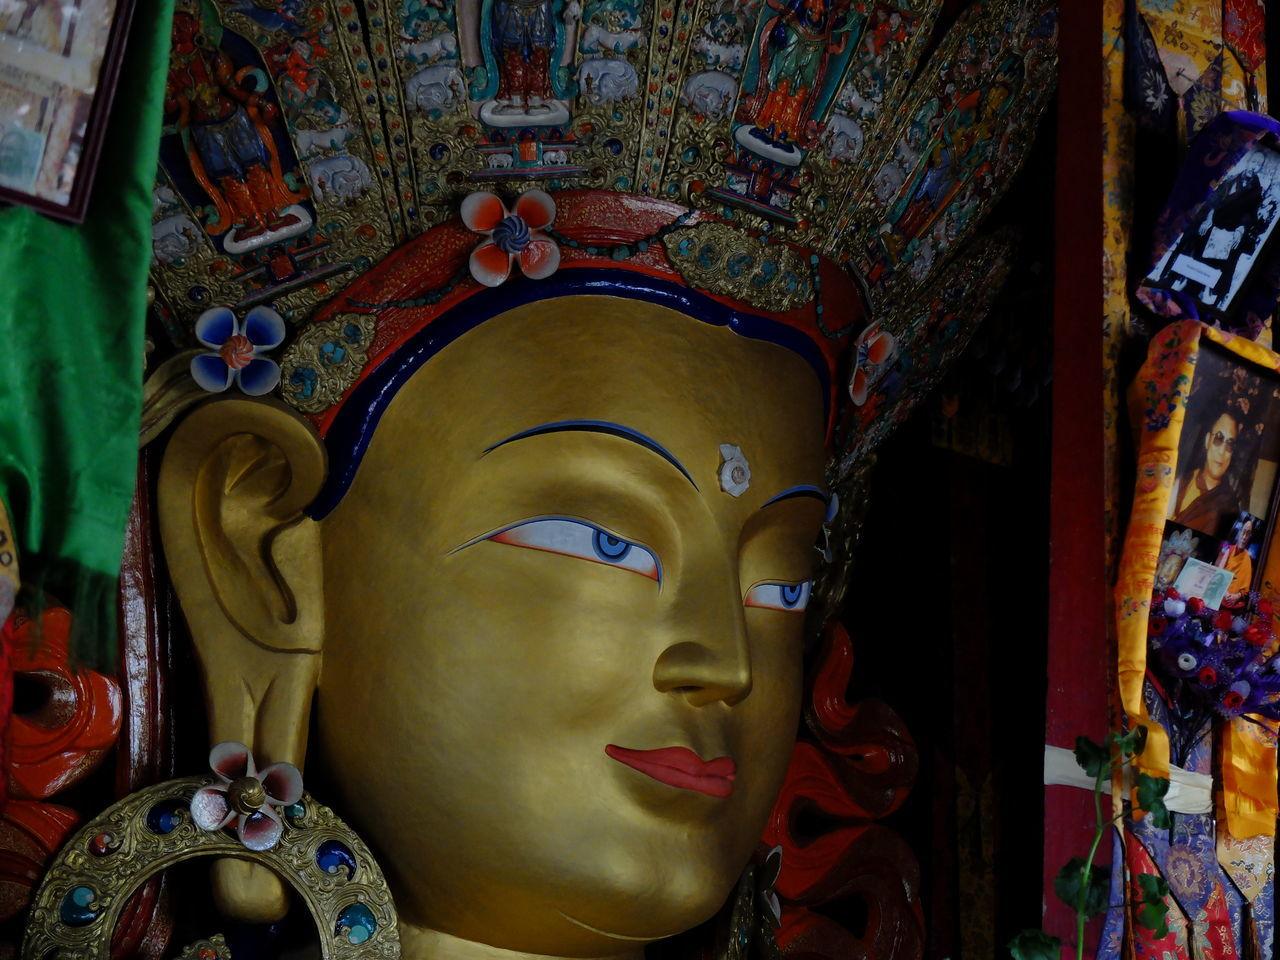 Day Human Representation Idol Indoors  Jammu And Kashmir Leh Ladakh No People Place Of Worship Religion Sculpture Spirituality Statue Symbol